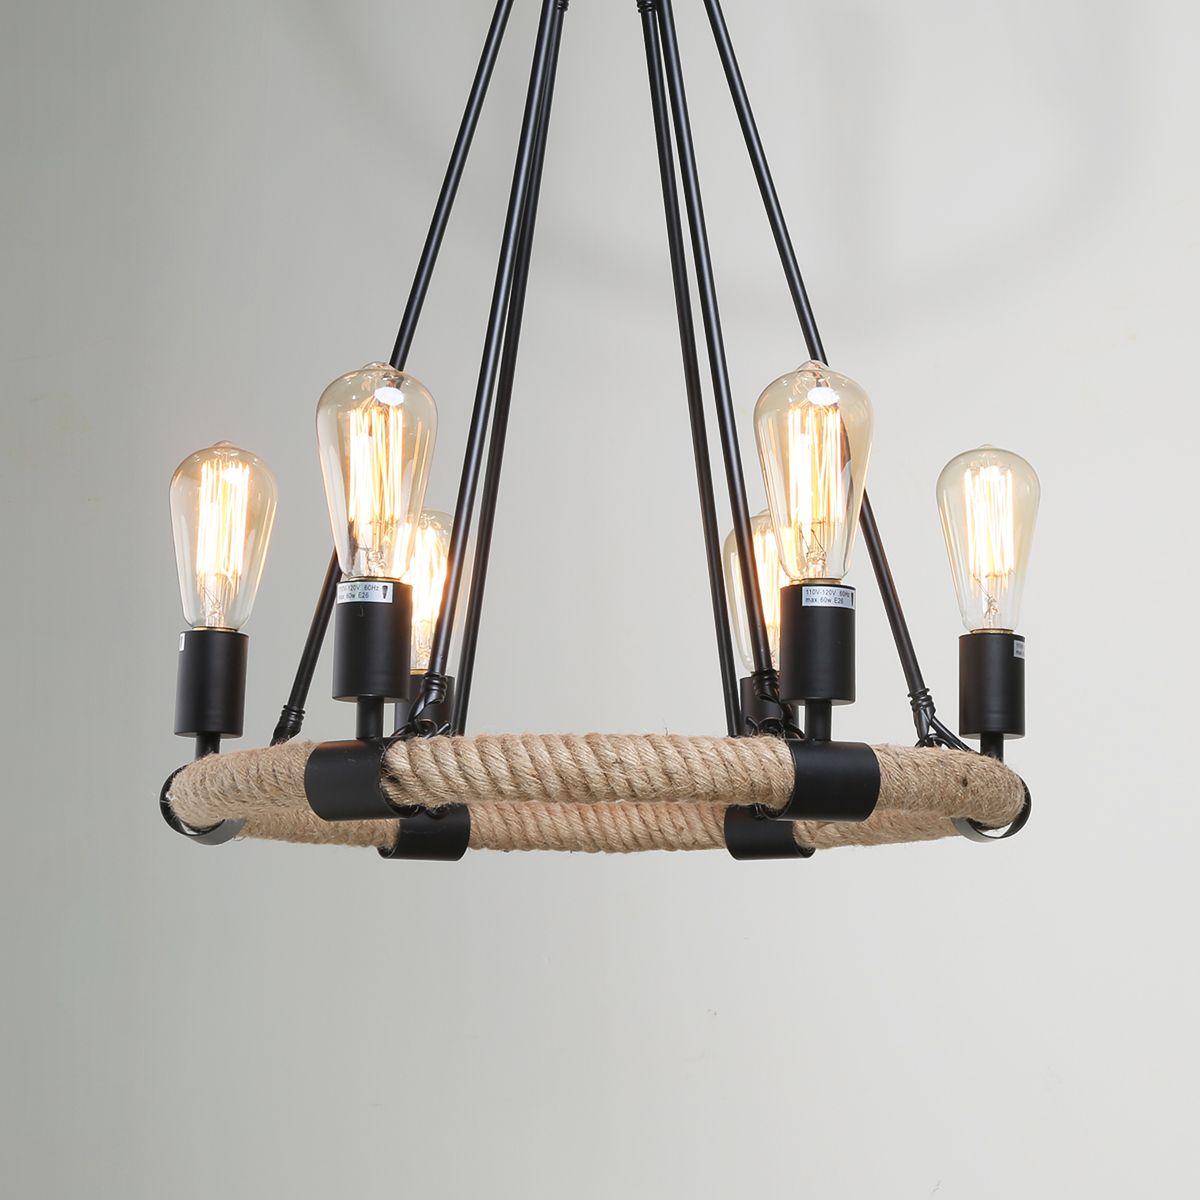 Rustic rope chandeliers transitional lighting pinteres pinterest